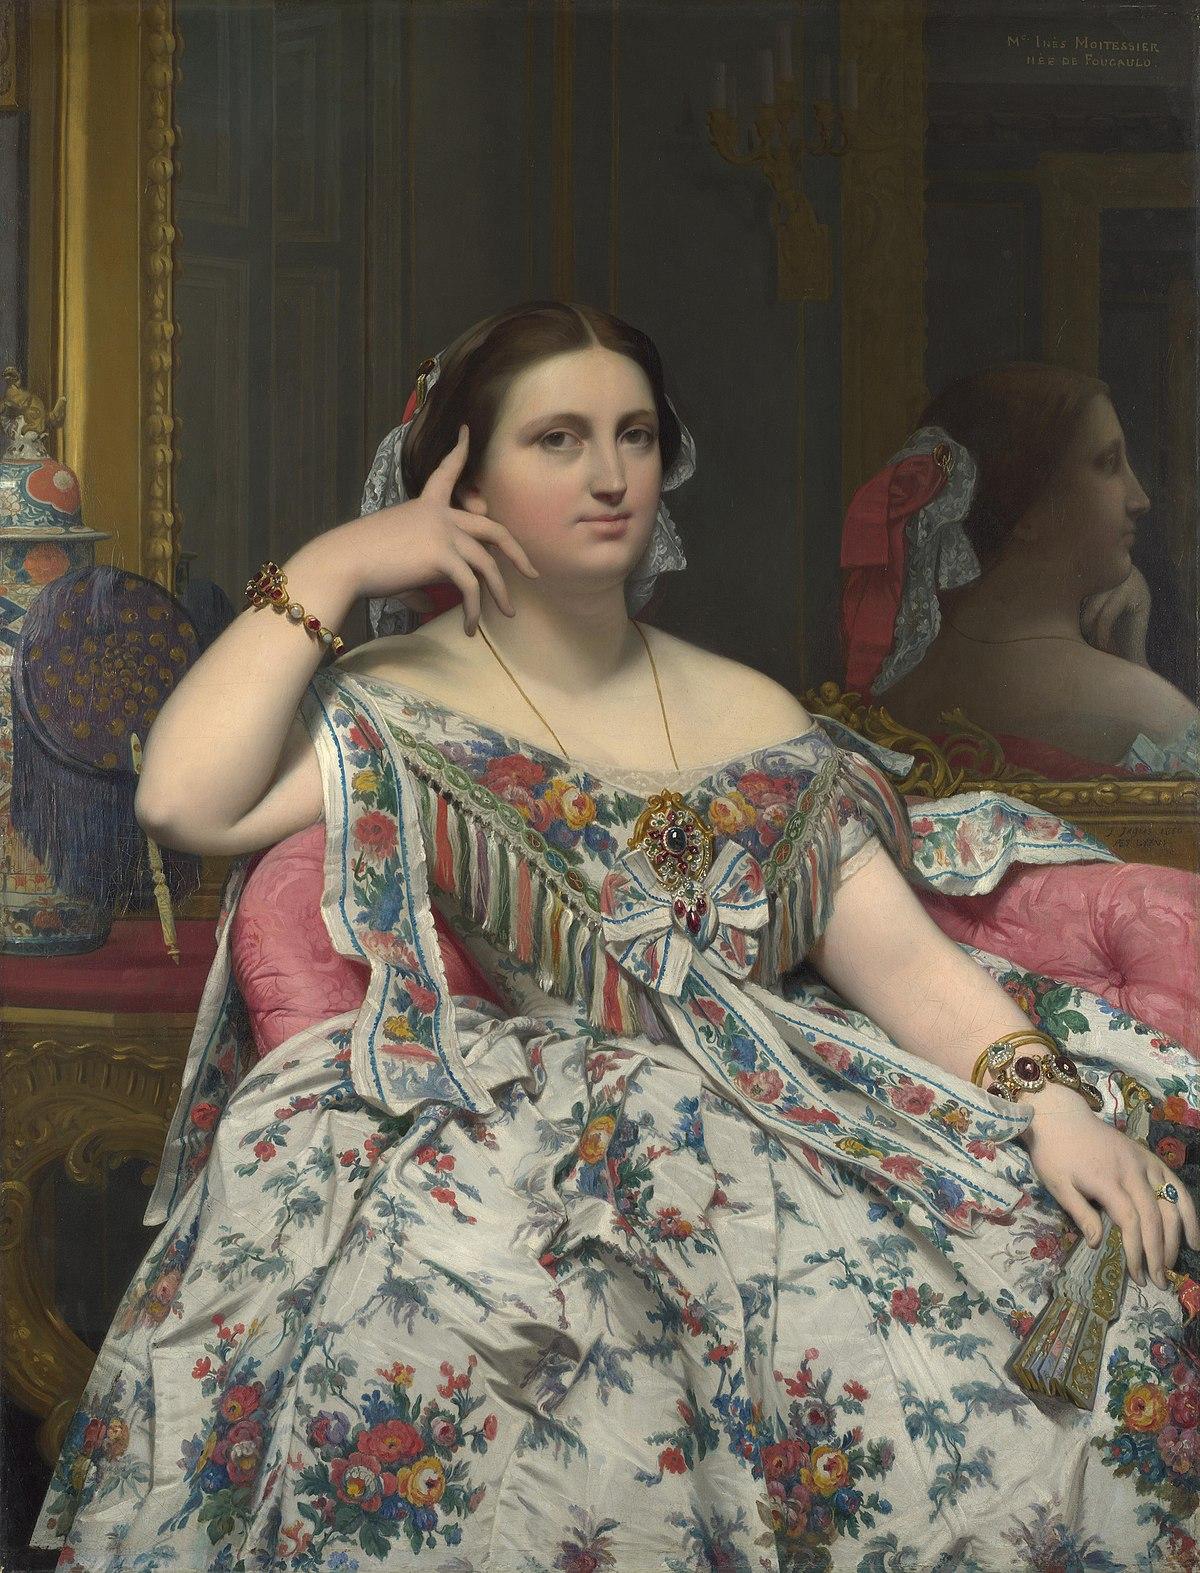 Ingres, Madame Moitessier, 1856. Olio su tela 120x92 cm. Londra, National Gallery